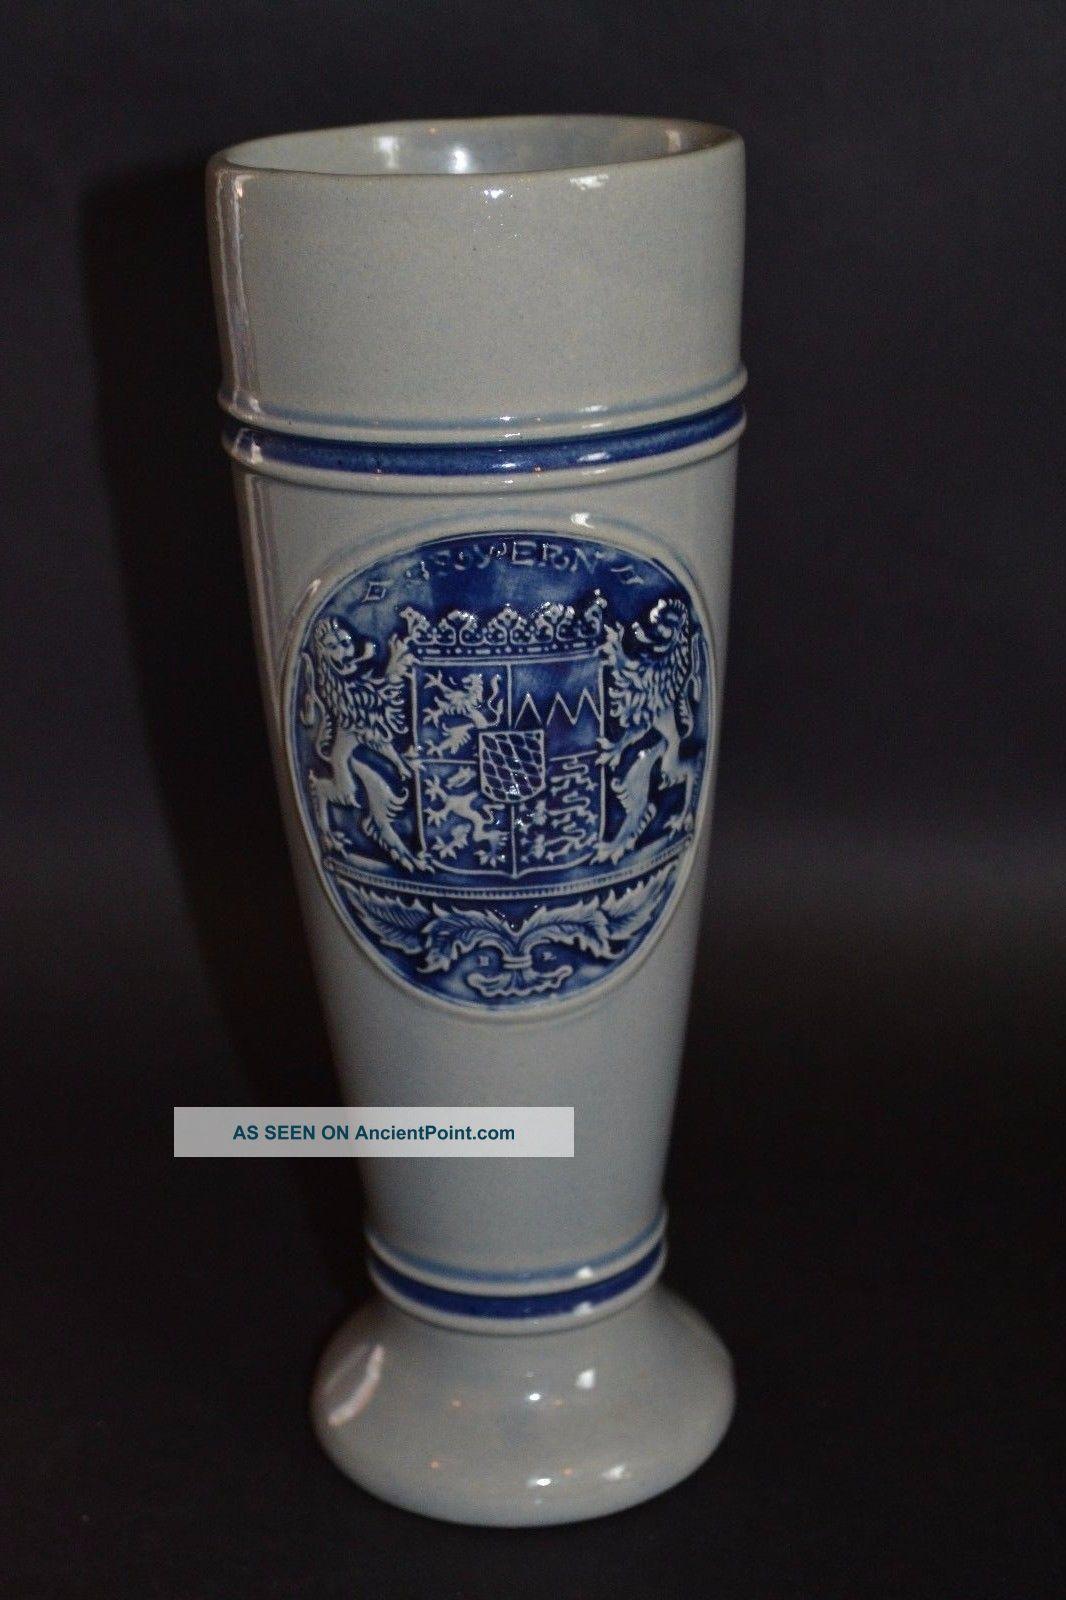 Rare Retro Vintage Westerwald Pottery Beer Tankard Pint Glass Stoneware Sculptures & Statues photo